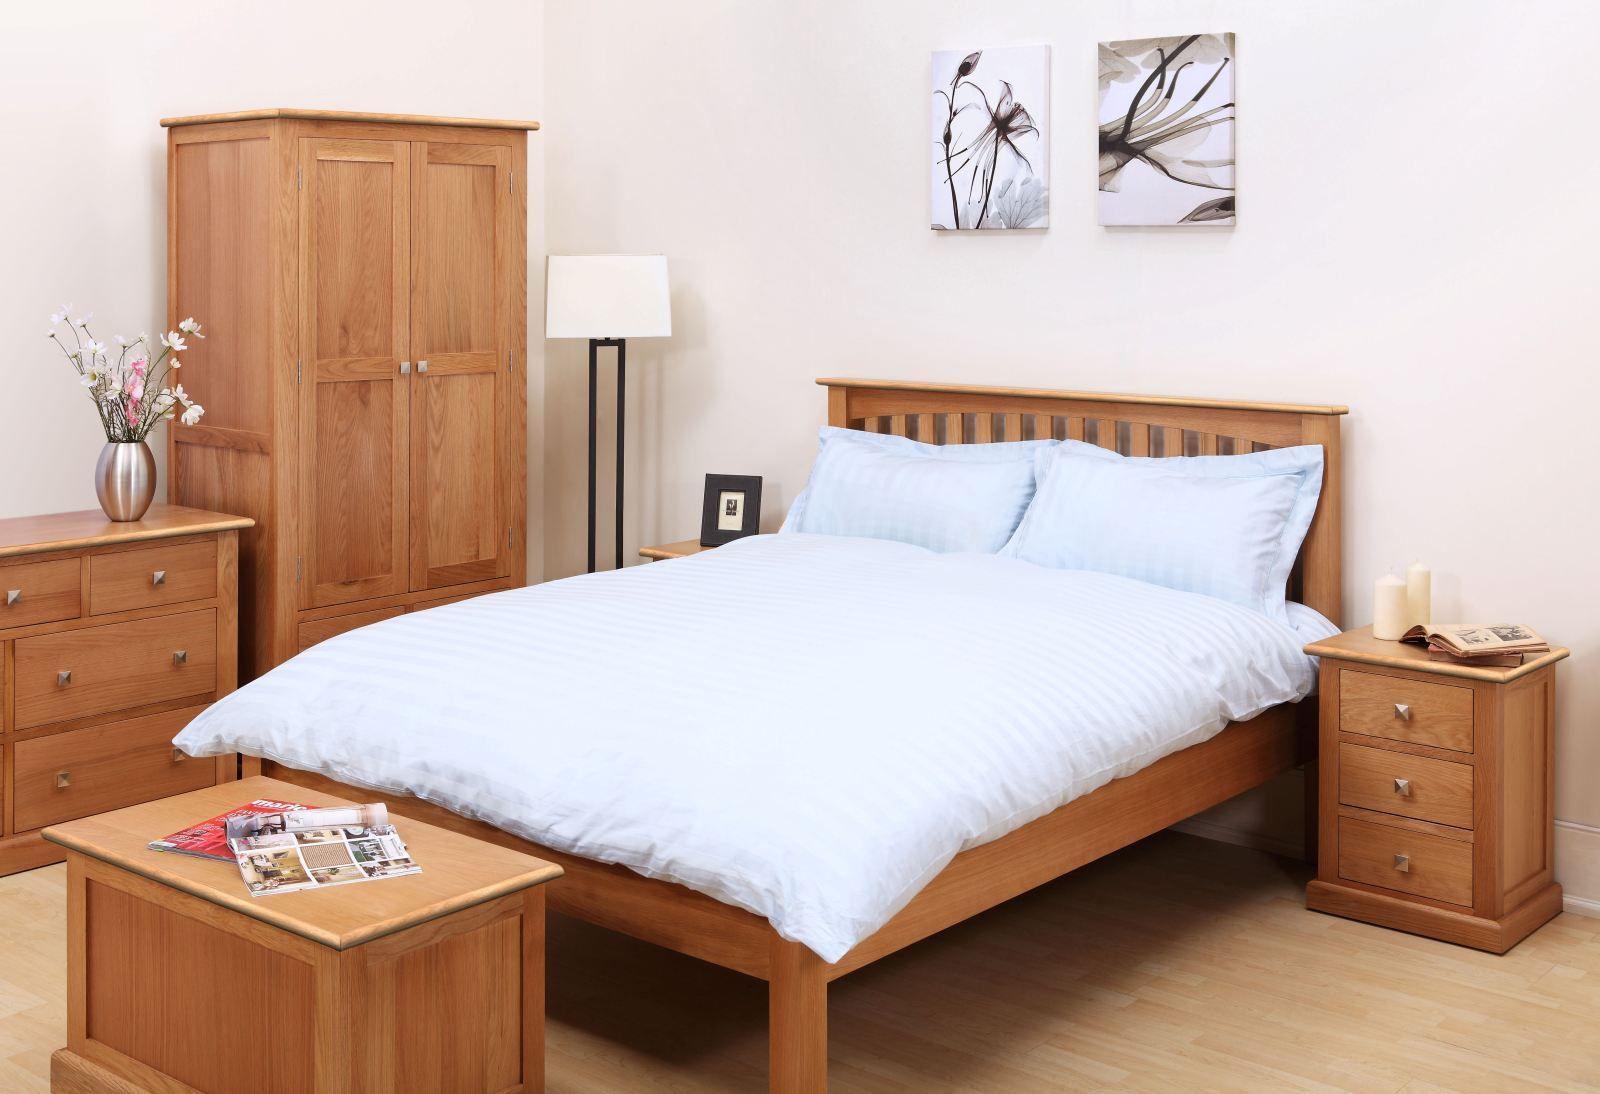 Aspen oak bedroom furniture is a lovely contemporary